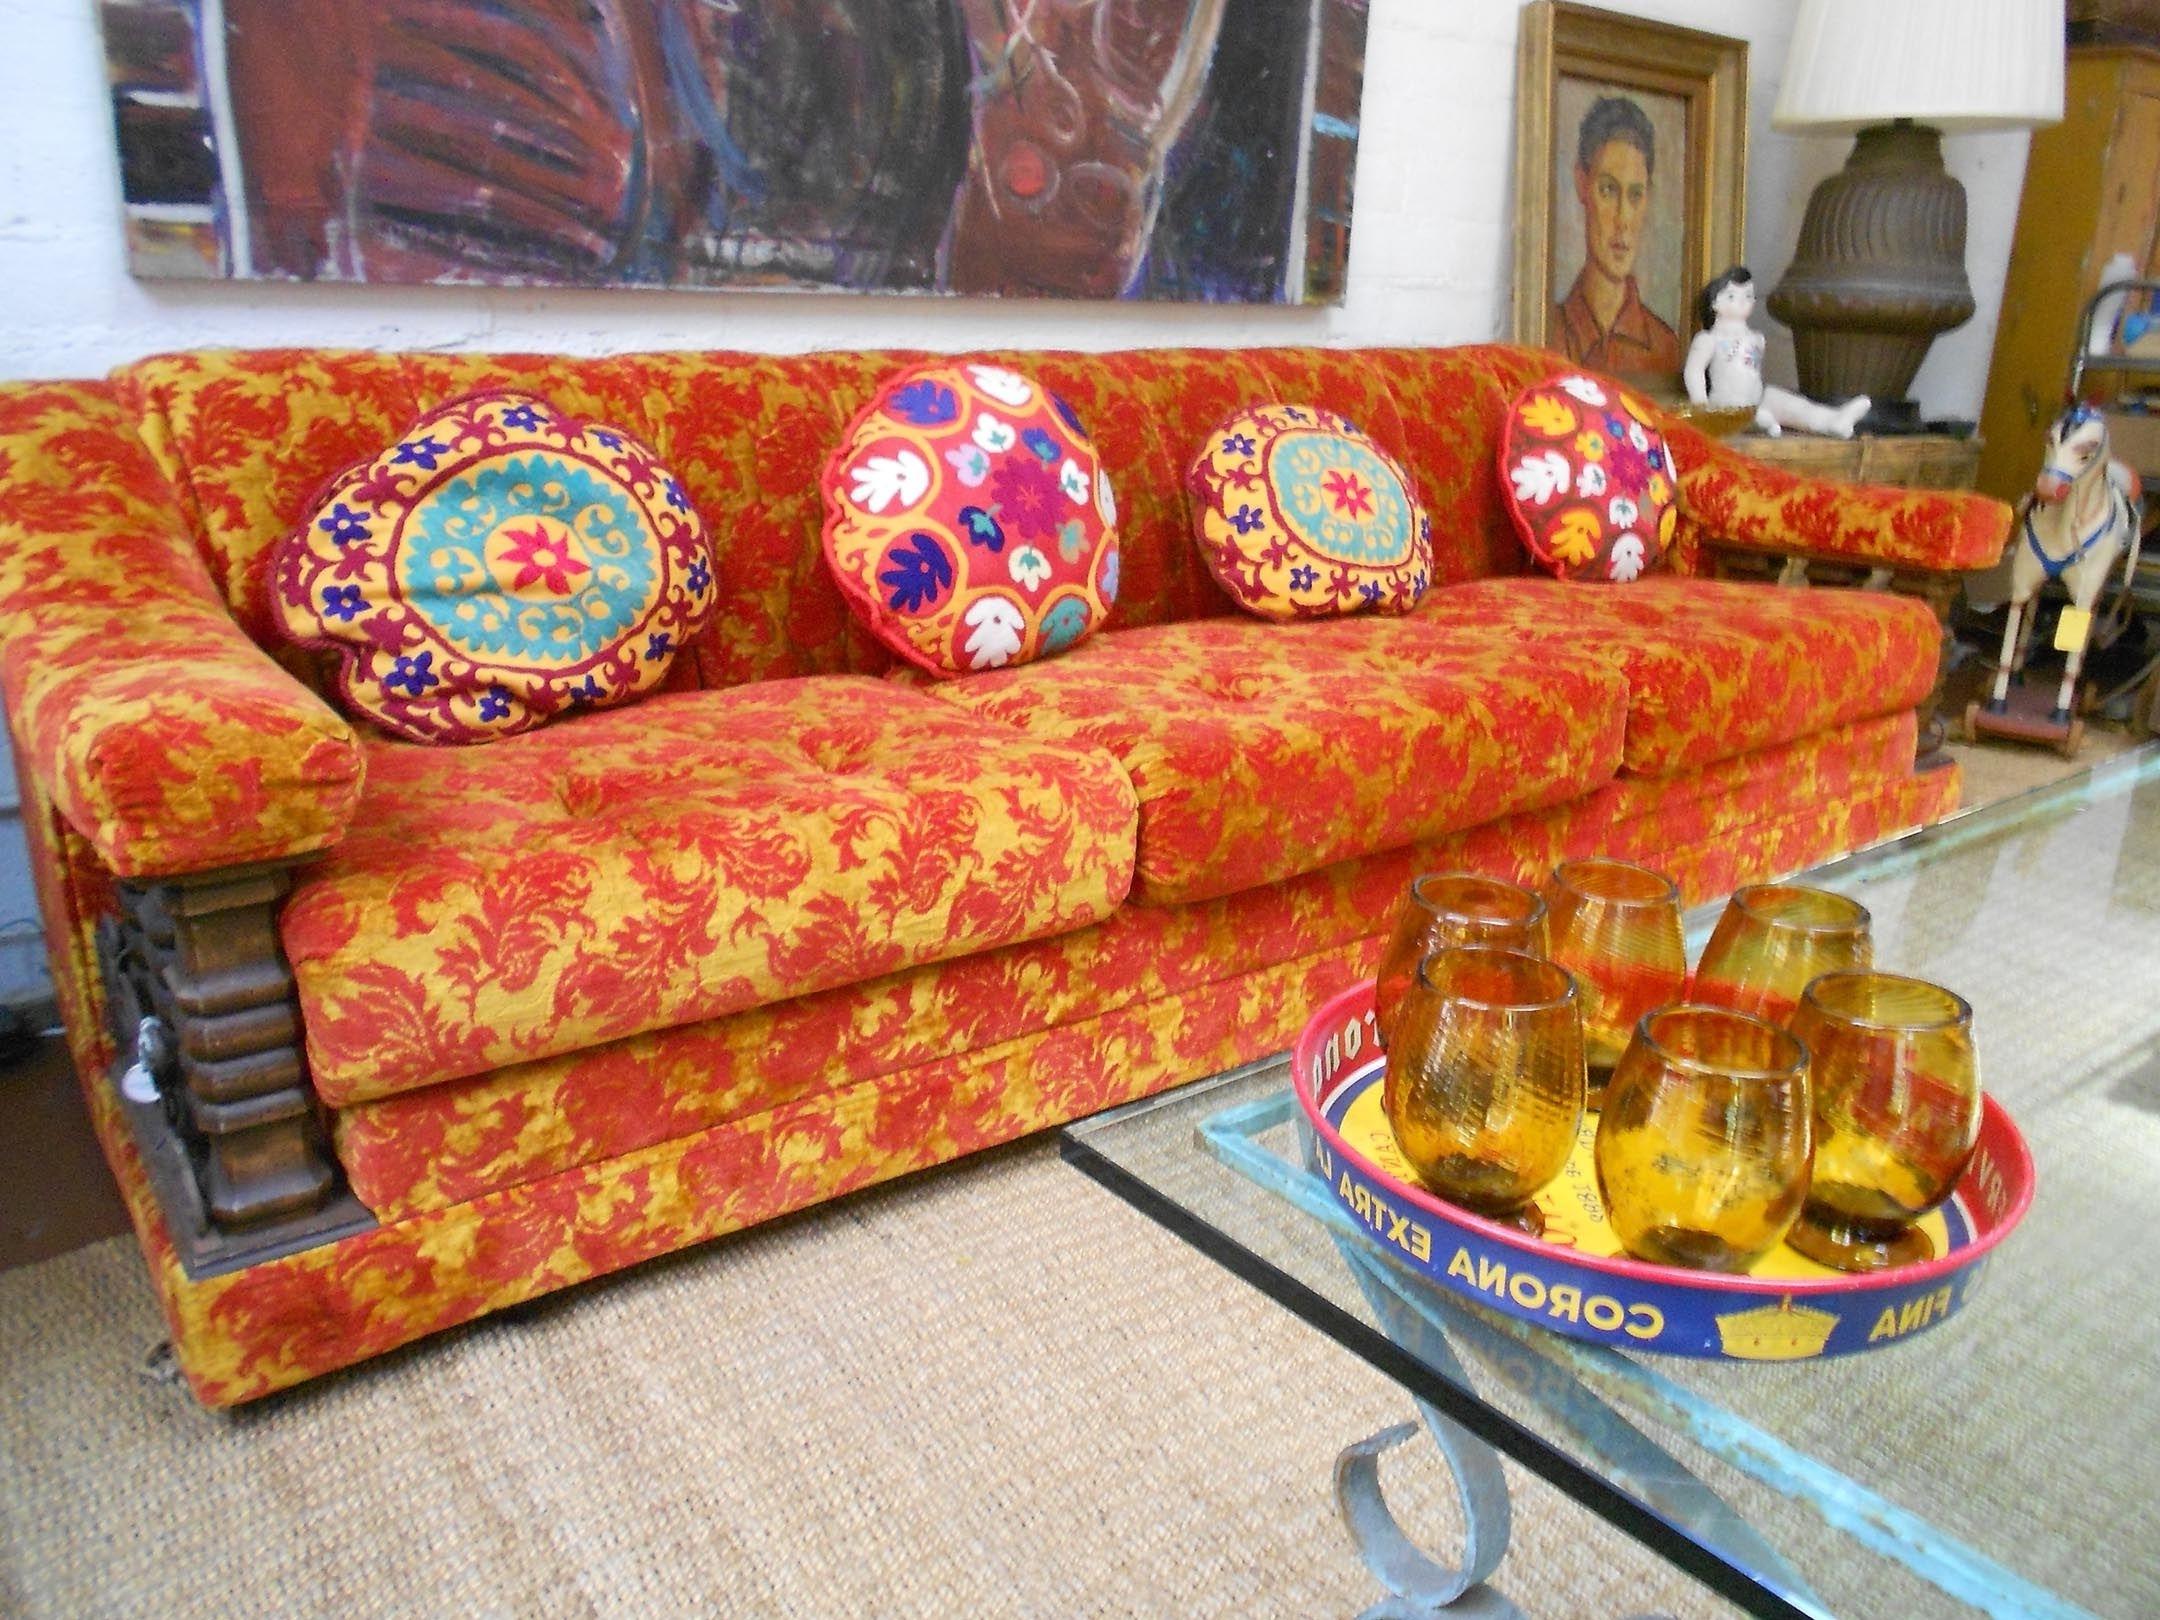 Sears Sectional Sofas Regarding 2019 Orange #red #brocade #sofa #1960's #uzbeki #pillows #handblown (View 11 of 20)